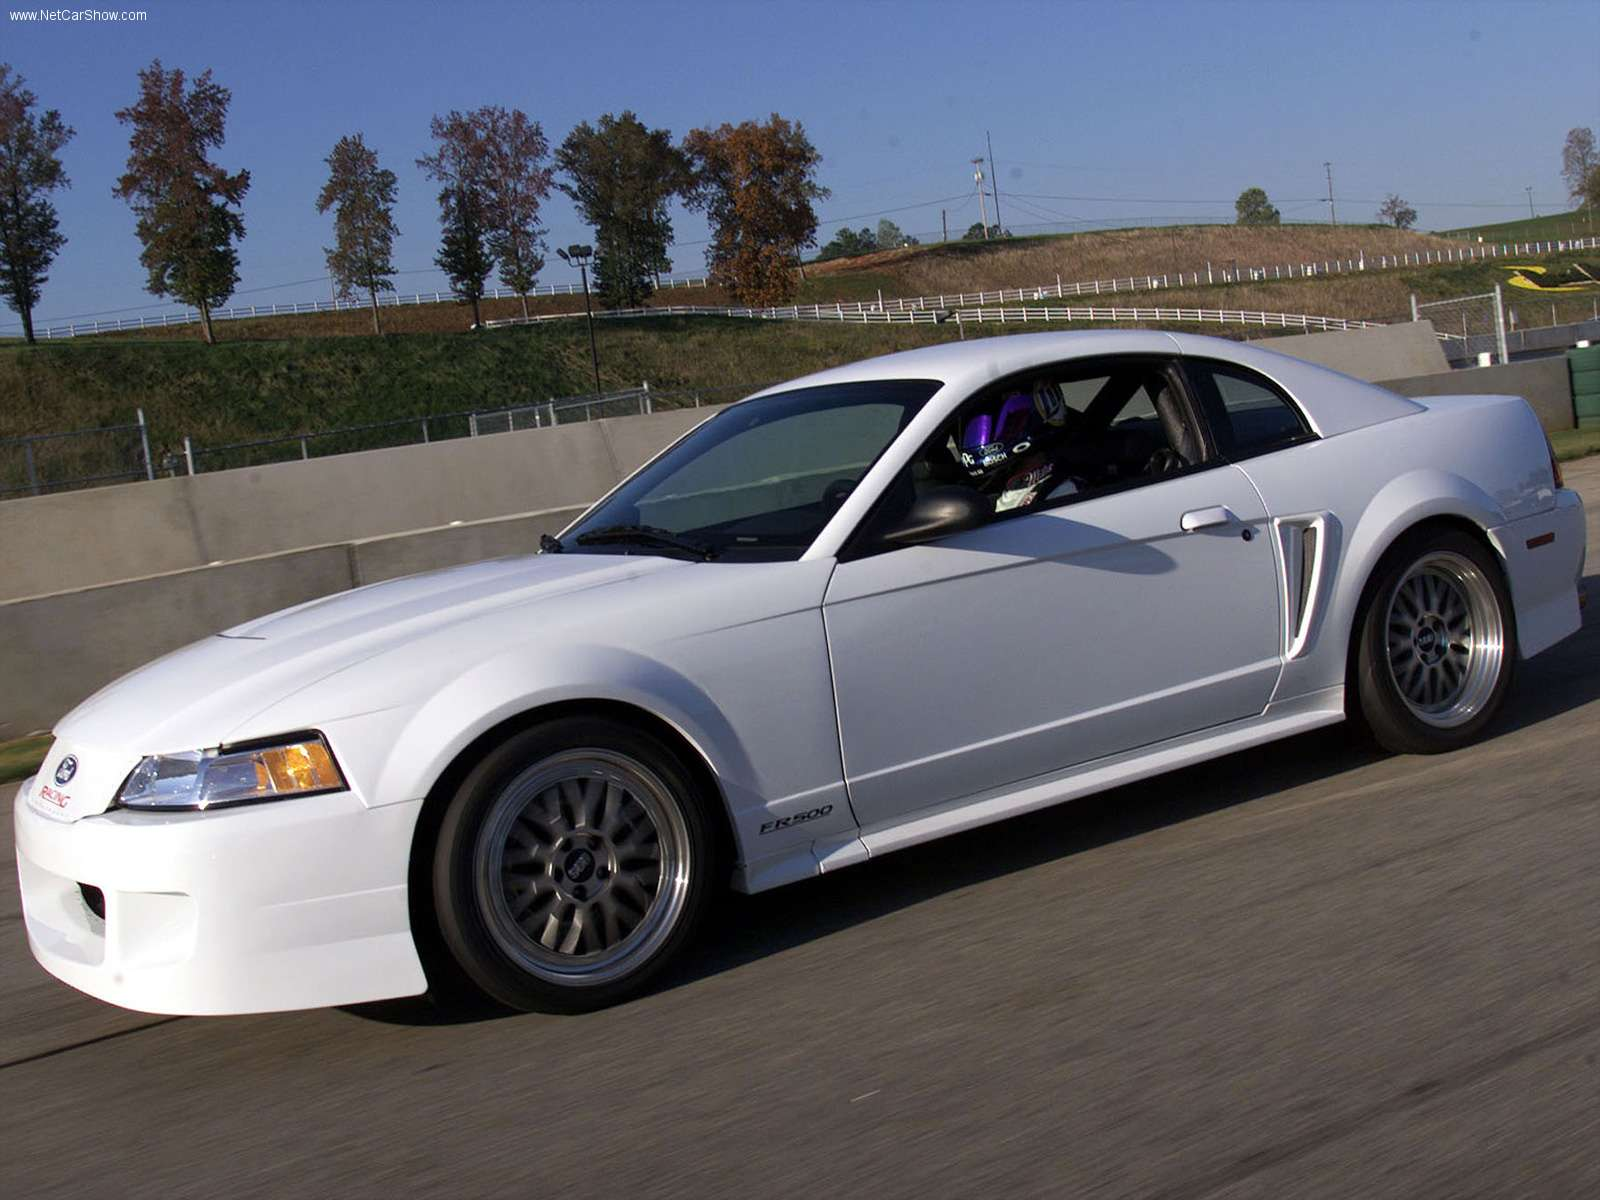 Ford Mustang Fr500 2000 Wallpaper 1600x1200 222001